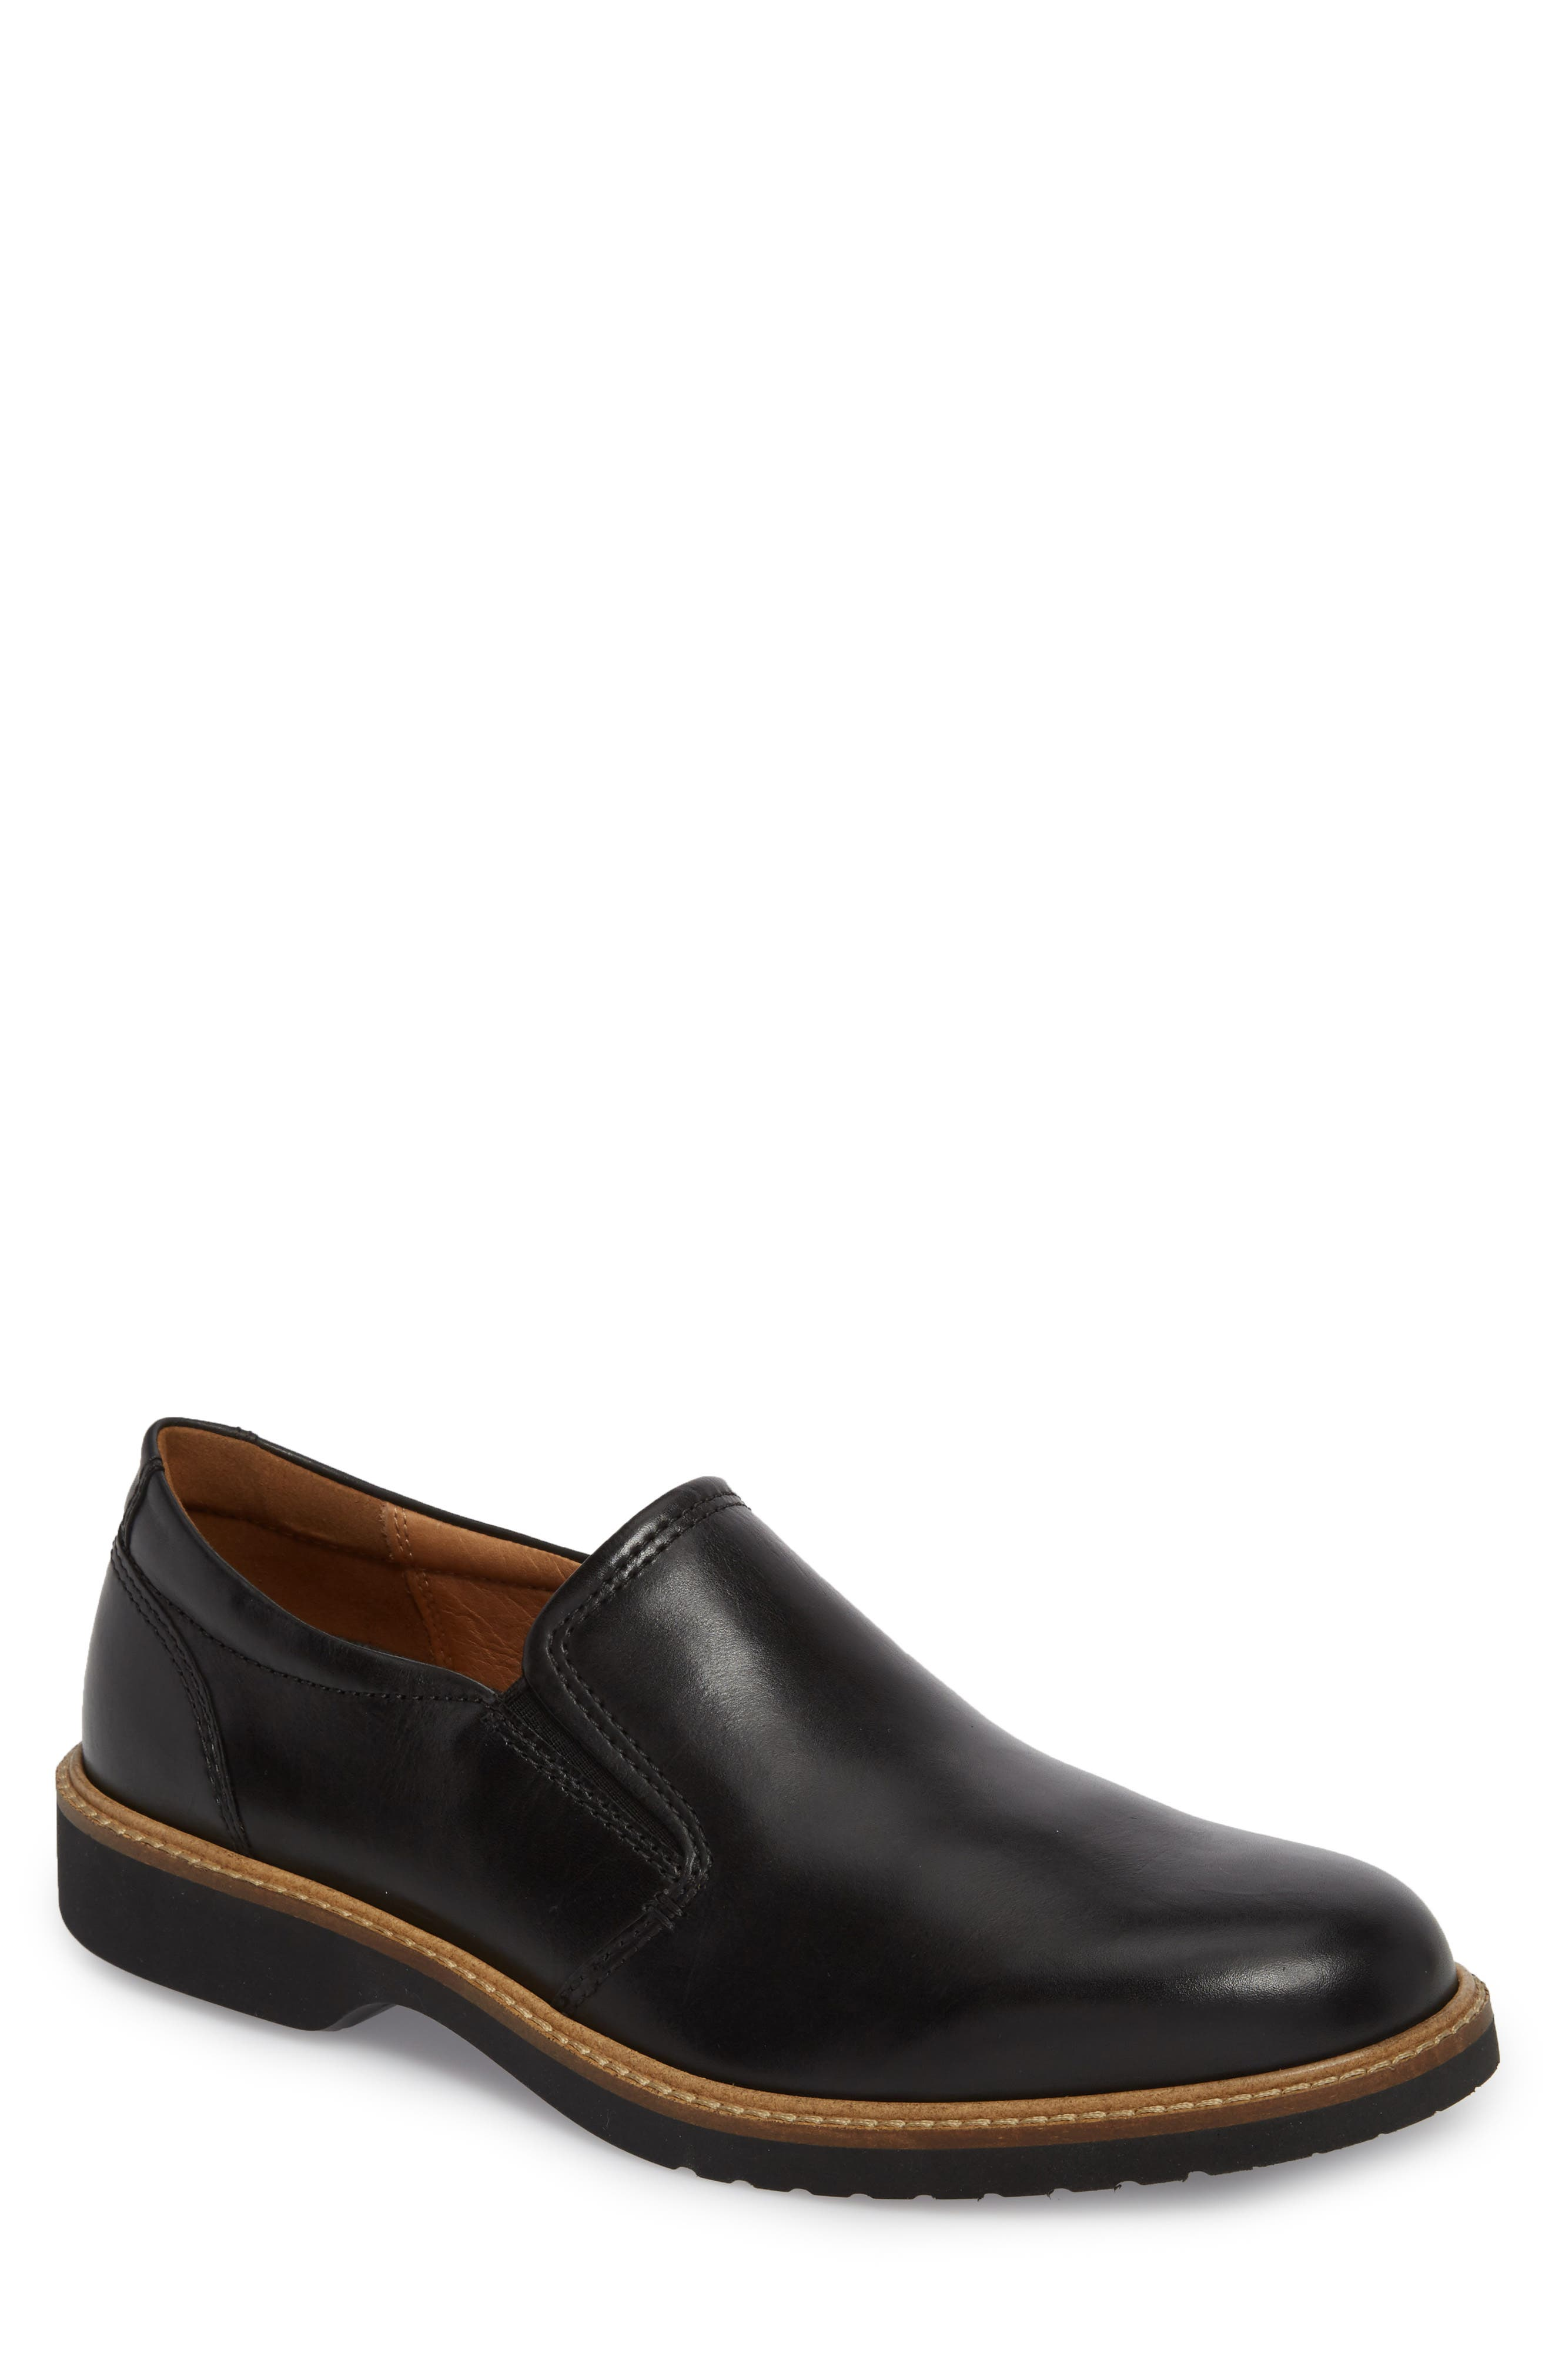 Ian Slip-On,                         Main,                         color, Black Leather